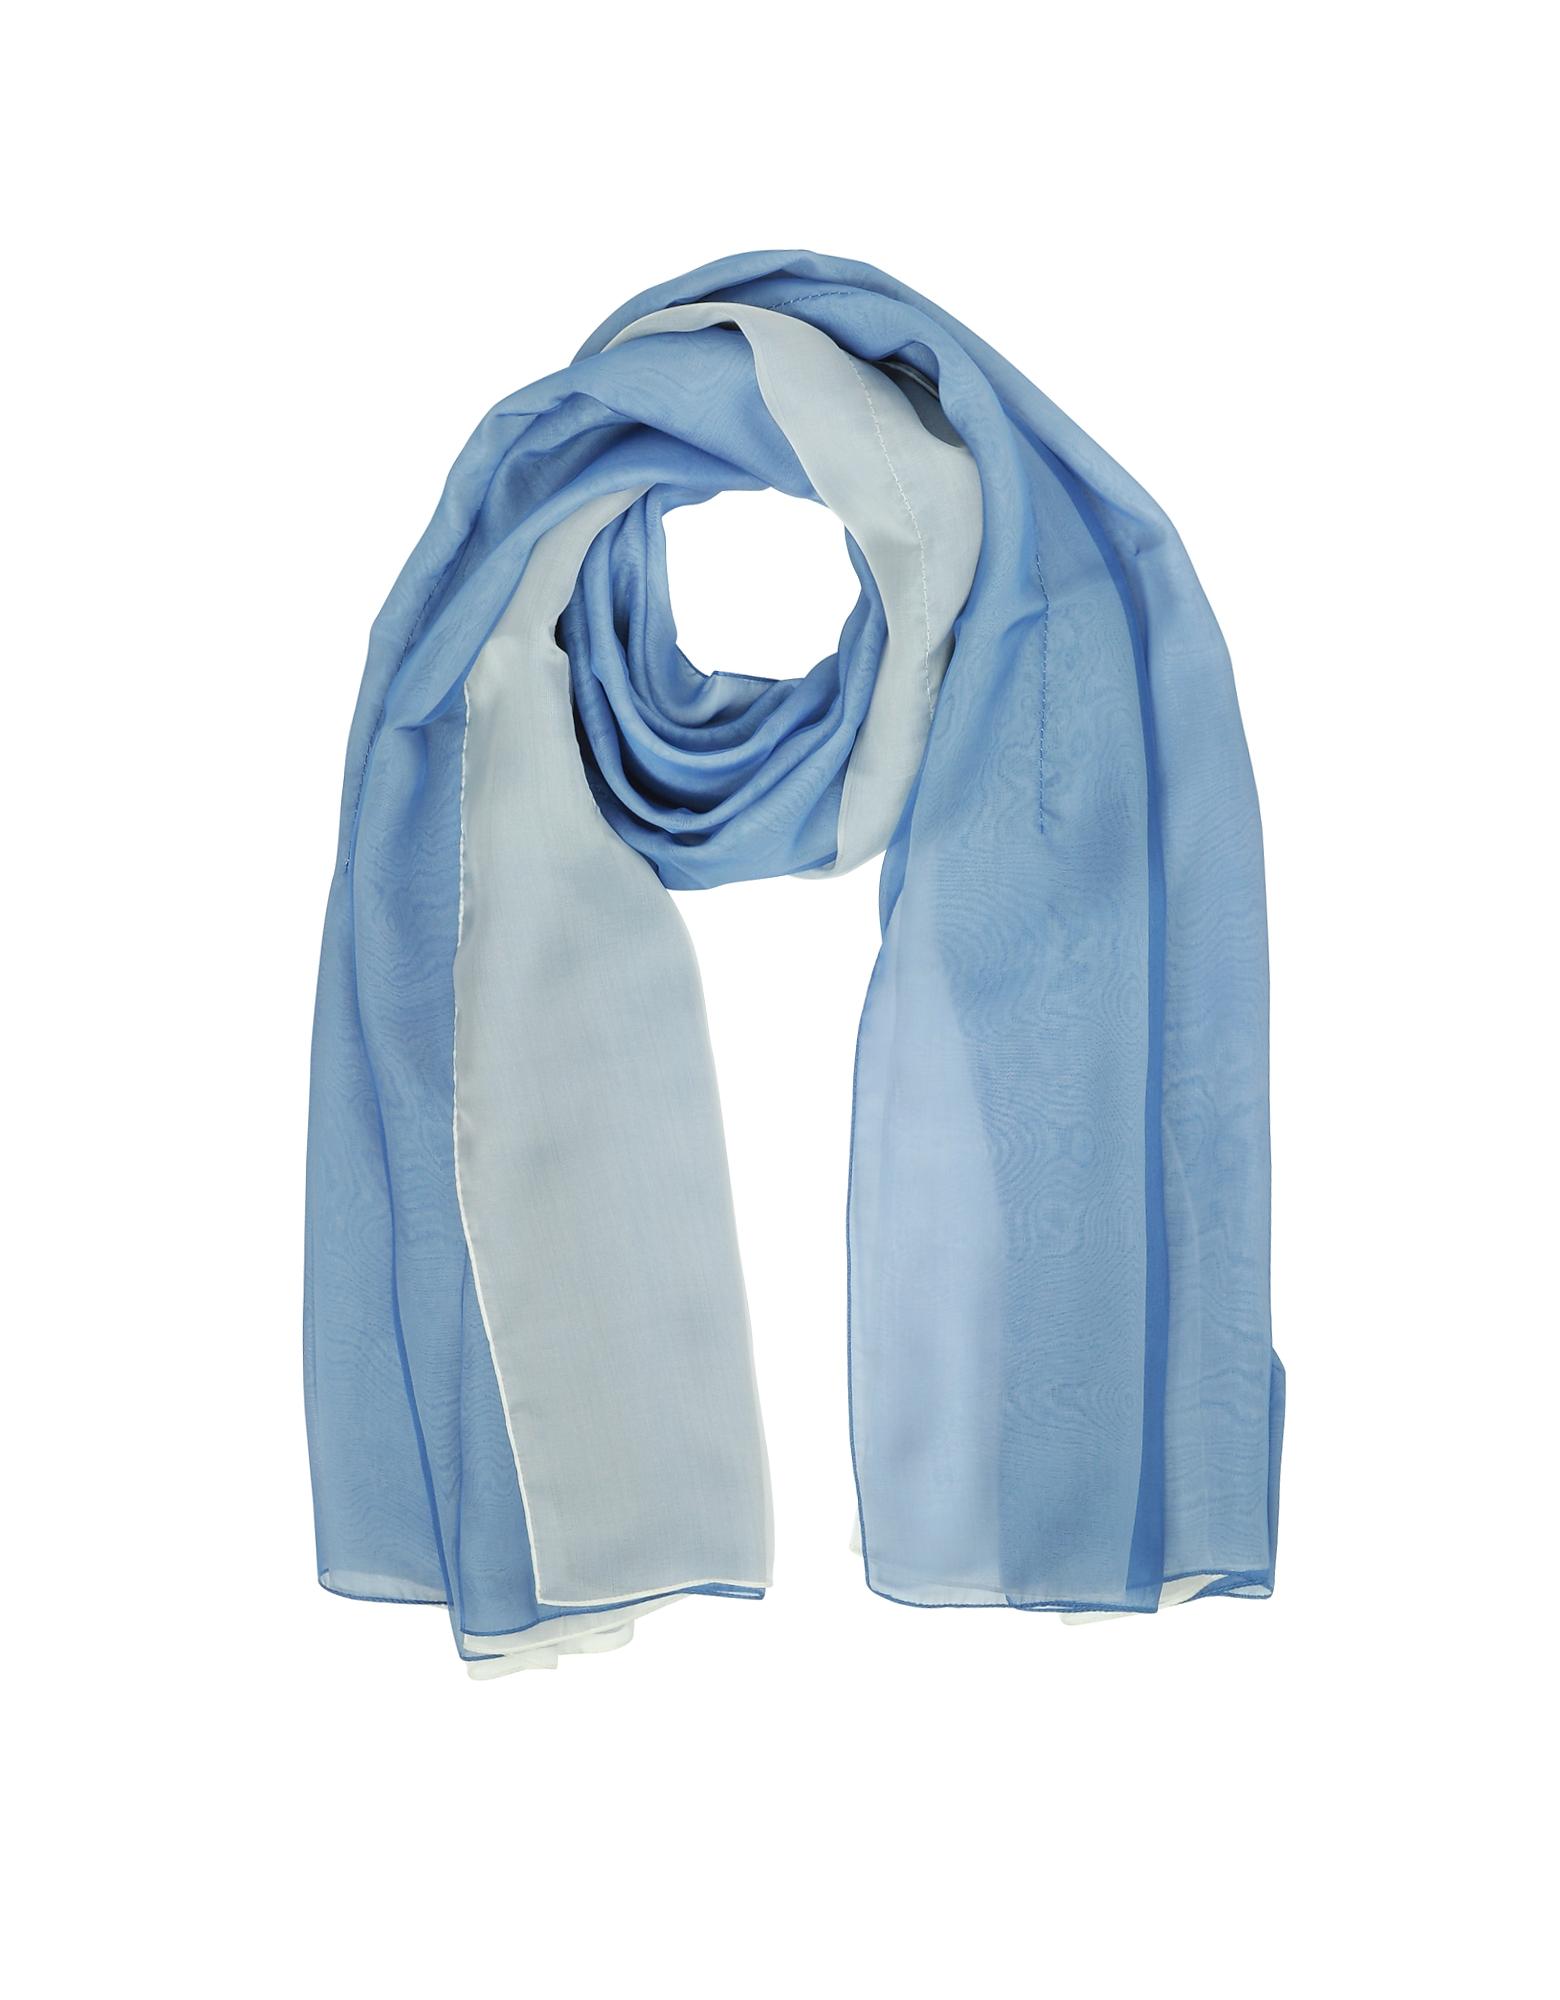 Double Chiffon Silk Stole, Light blue/white